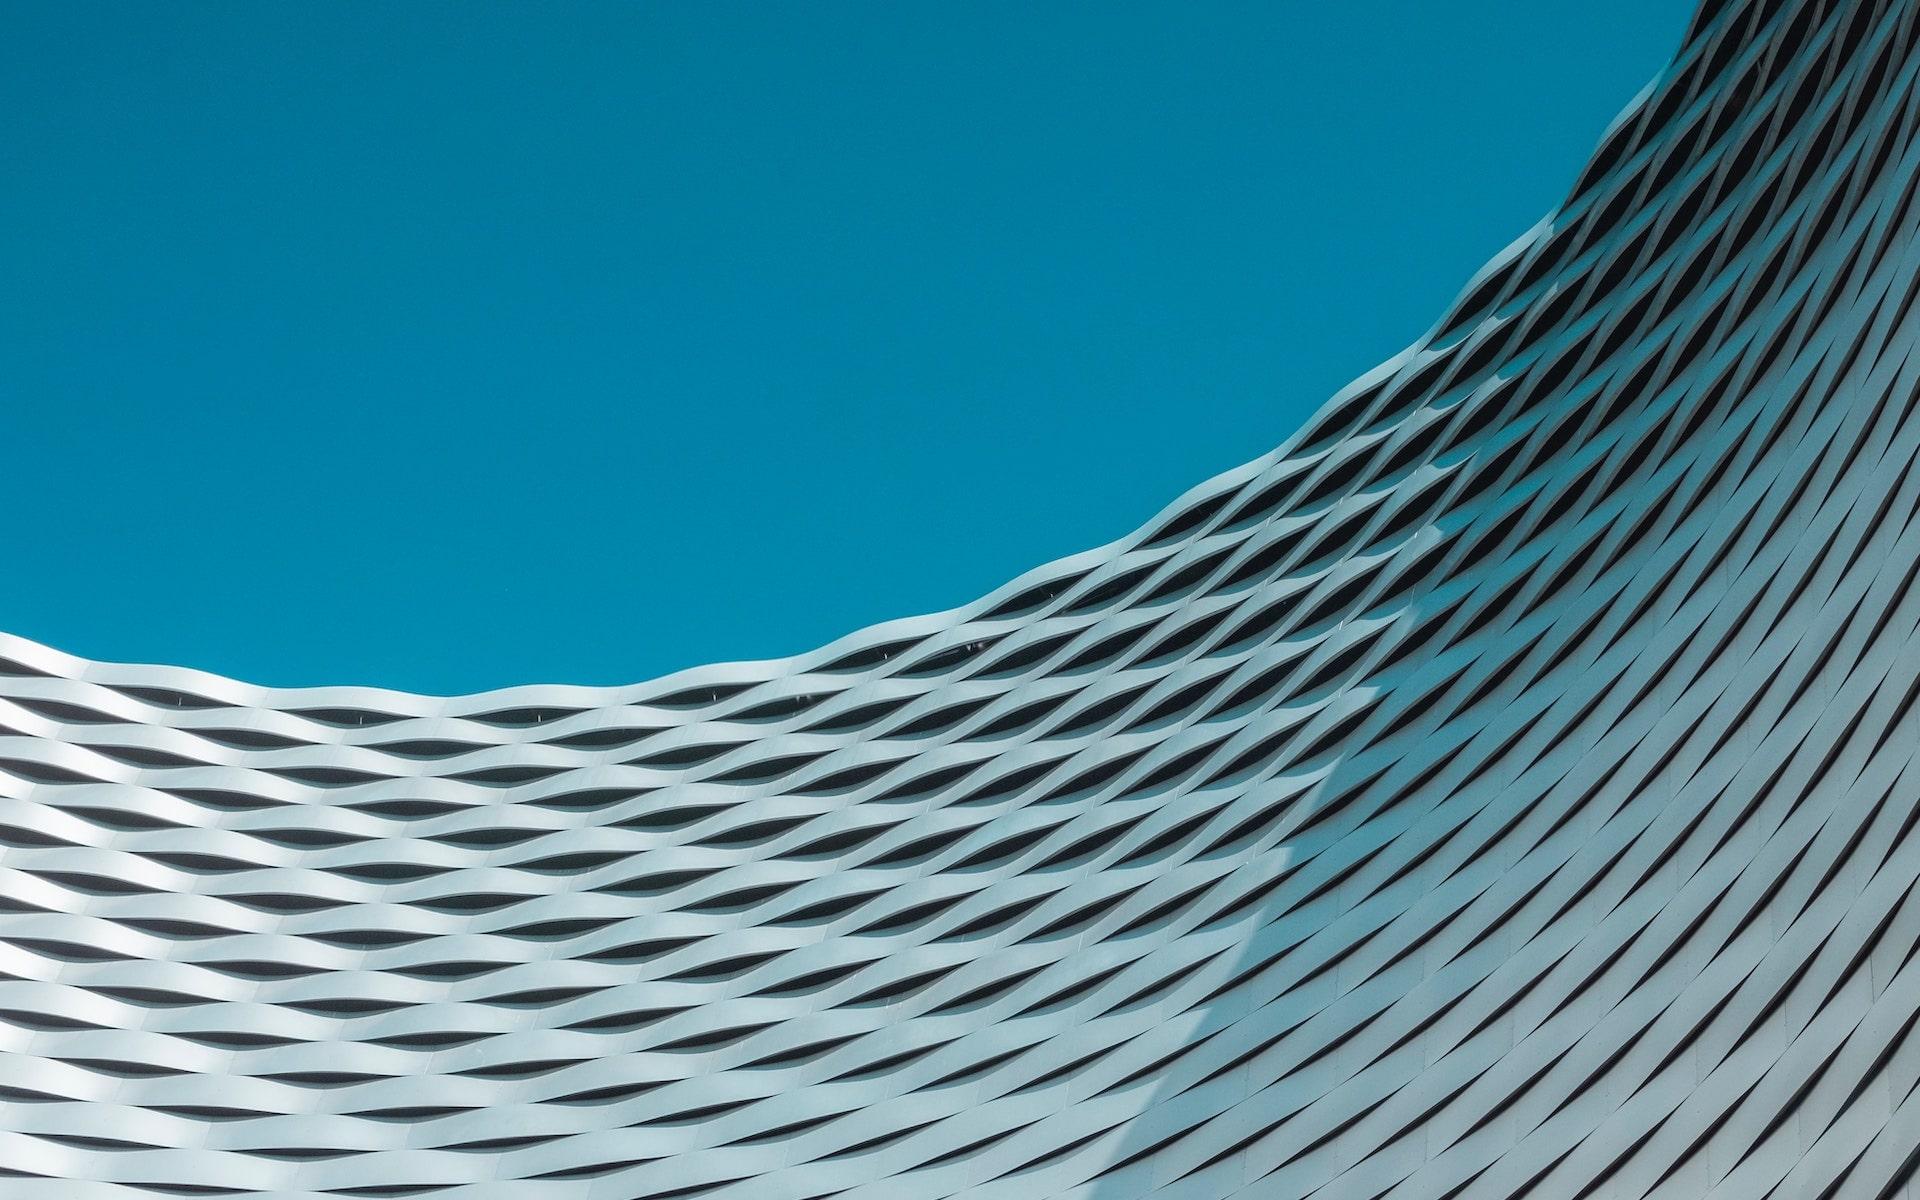 7 Eye-Opening Web Design Statistics for 2020